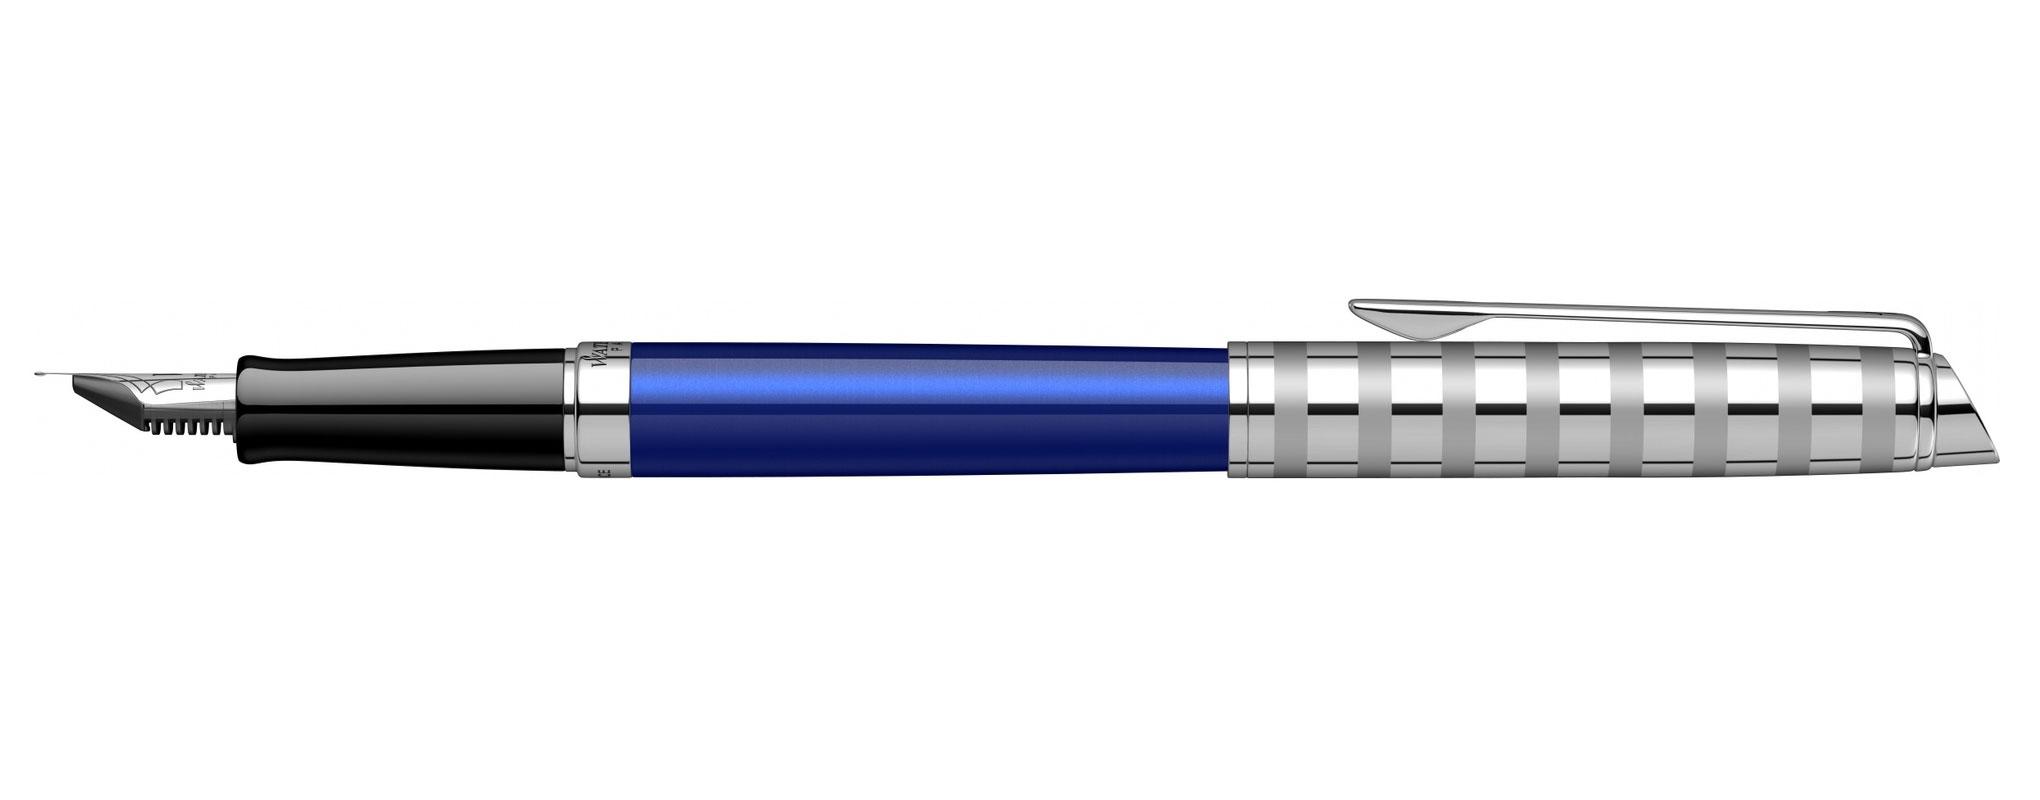 2117784 Ручка перьевая Waterman Hemisphere Deluxe Marine Blue F сталь нержавеющая